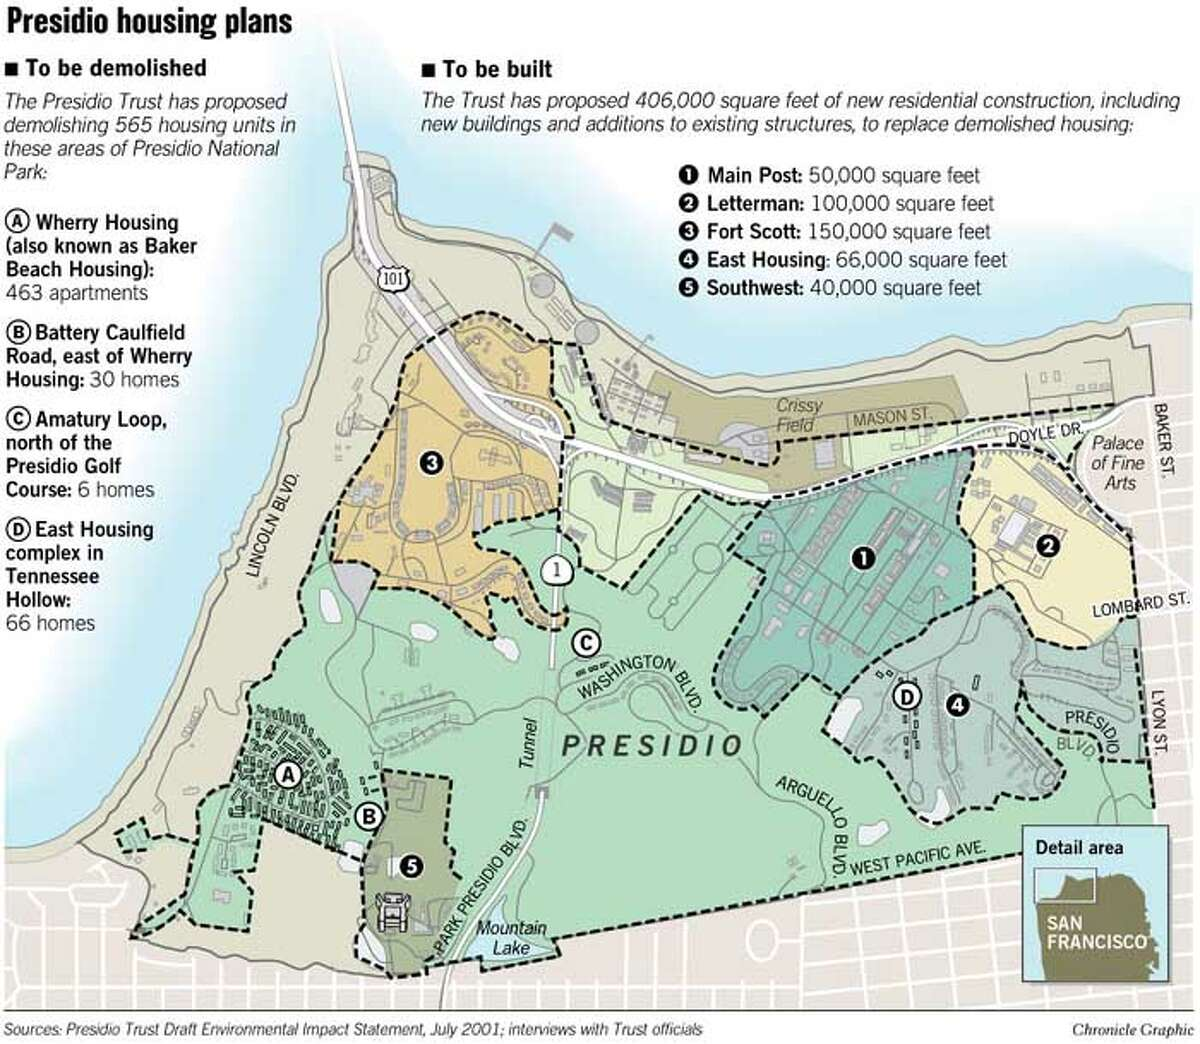 Presidio Housing Plans. Chronicle Graphic